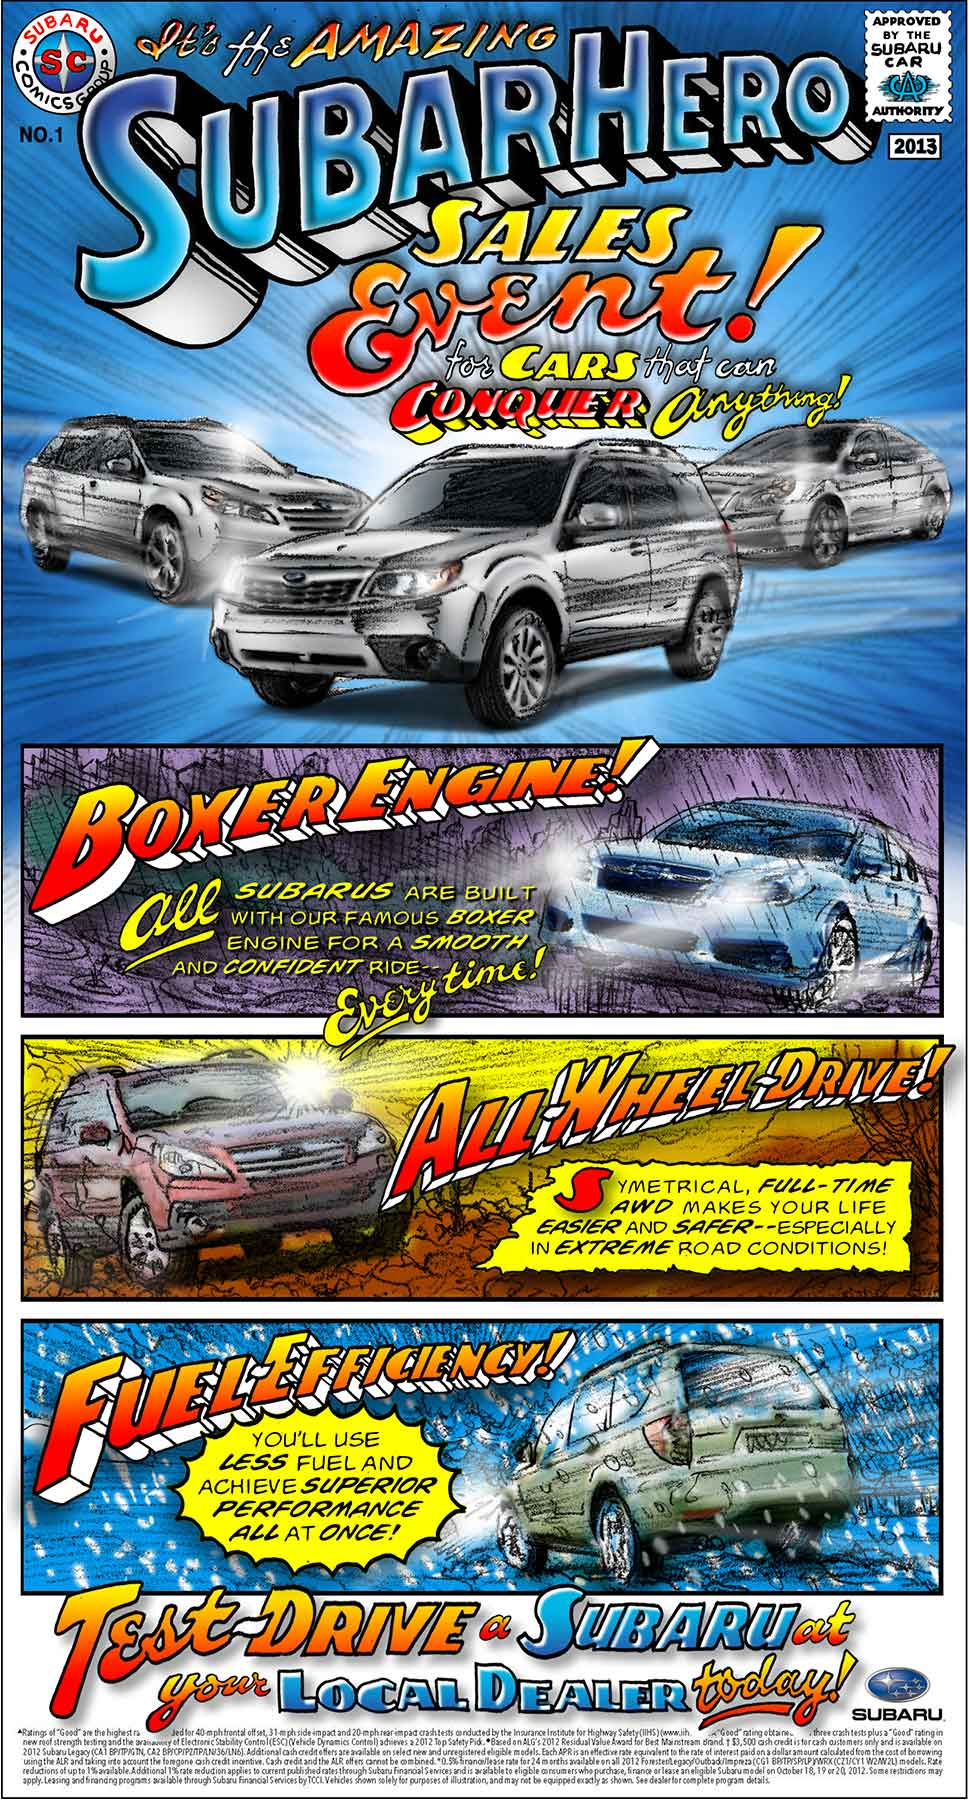 Arlen Schumer / Long Forgotten / Subaru Ad